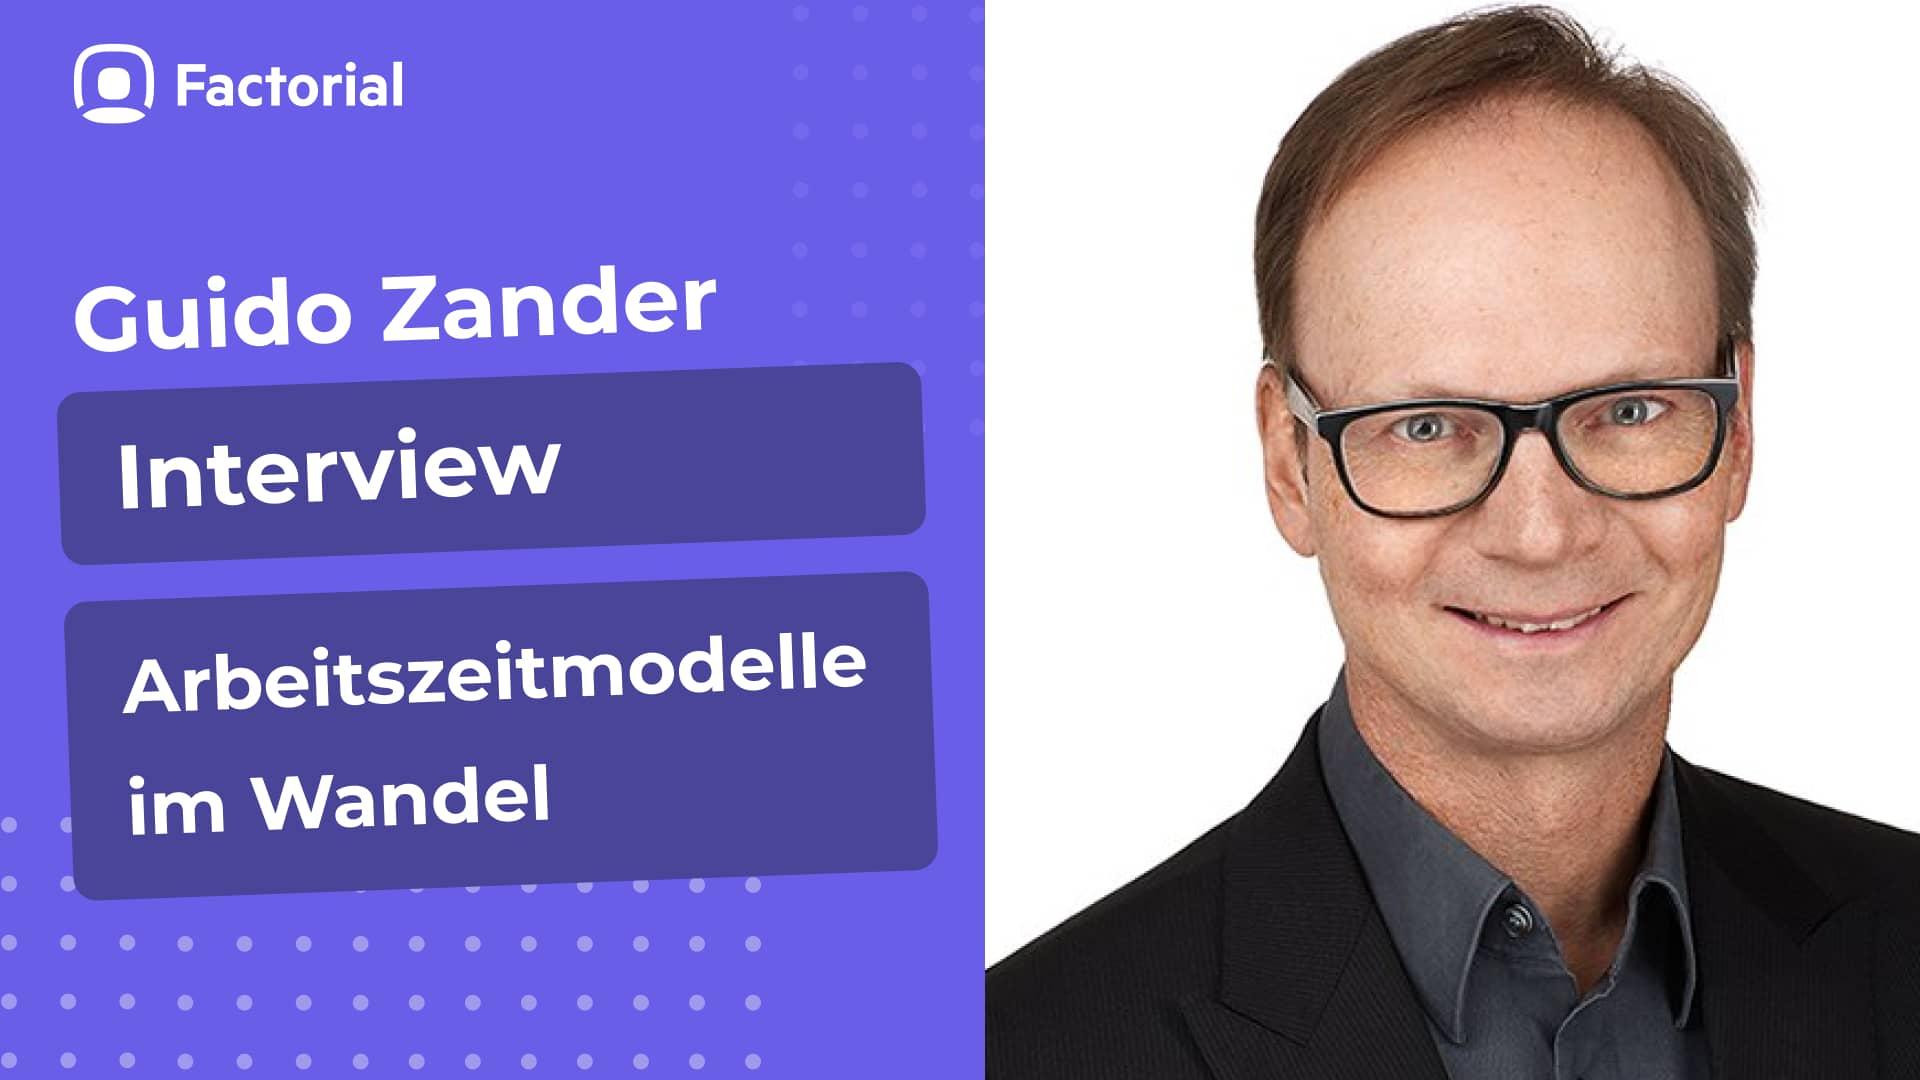 https://factorialhr.de/wp-content/uploads/2021/07/23095557/Interview_Arbeitszeitmodelle.jpg